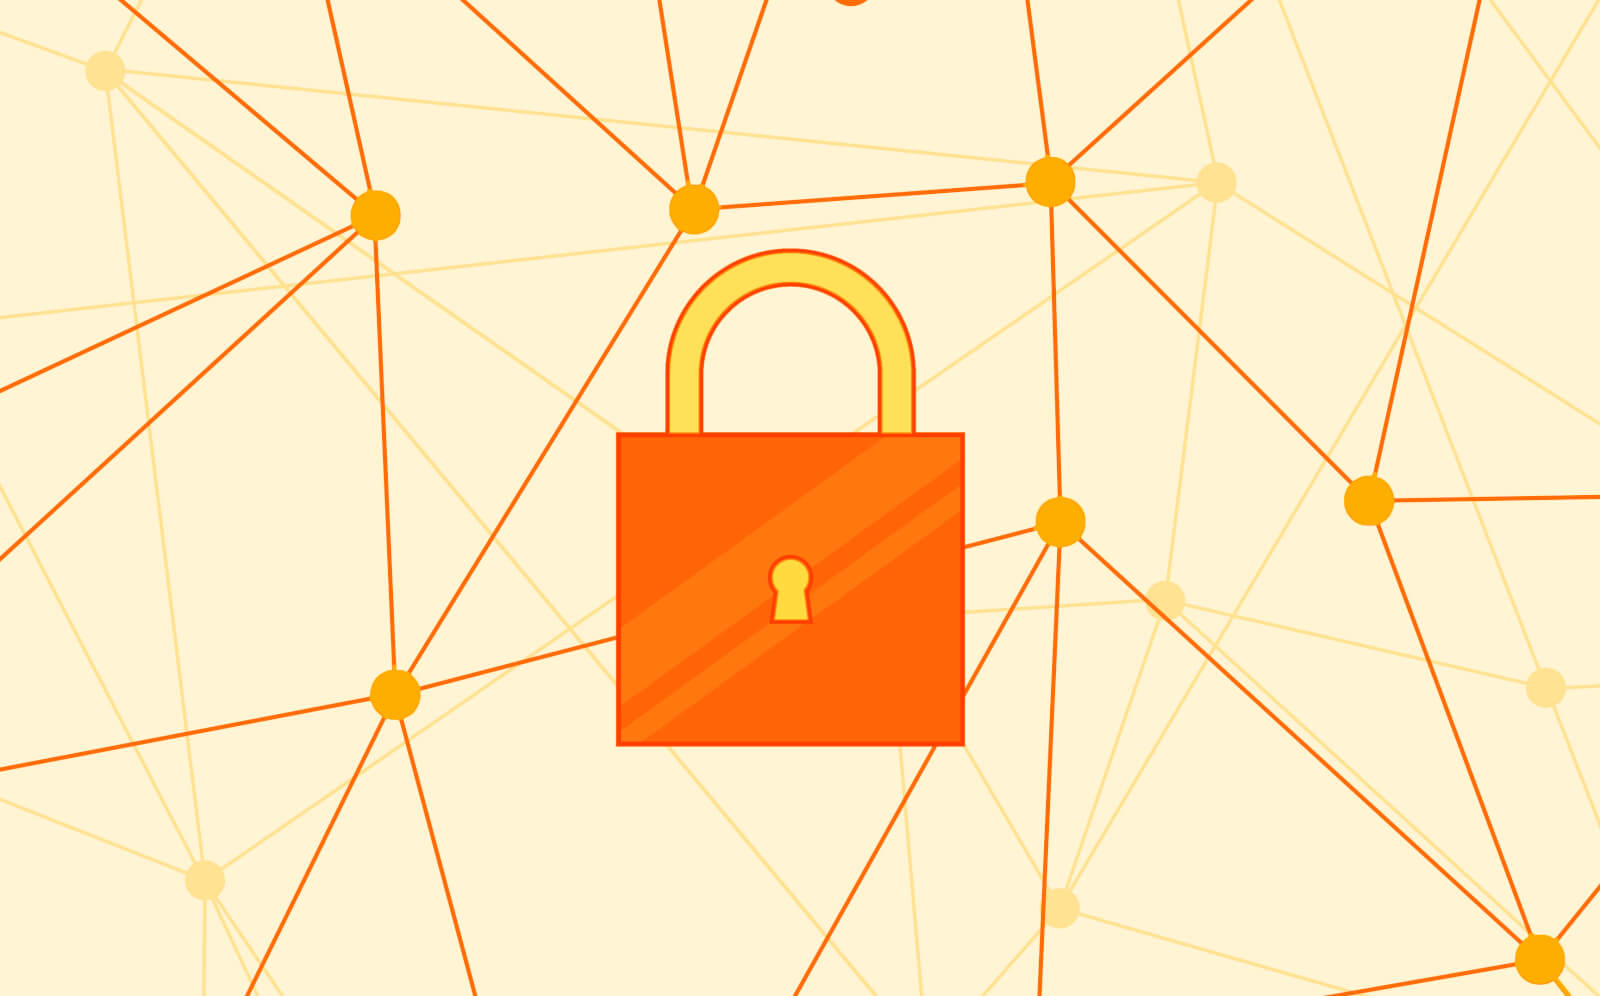 cybersecurity, IoT, blockchain